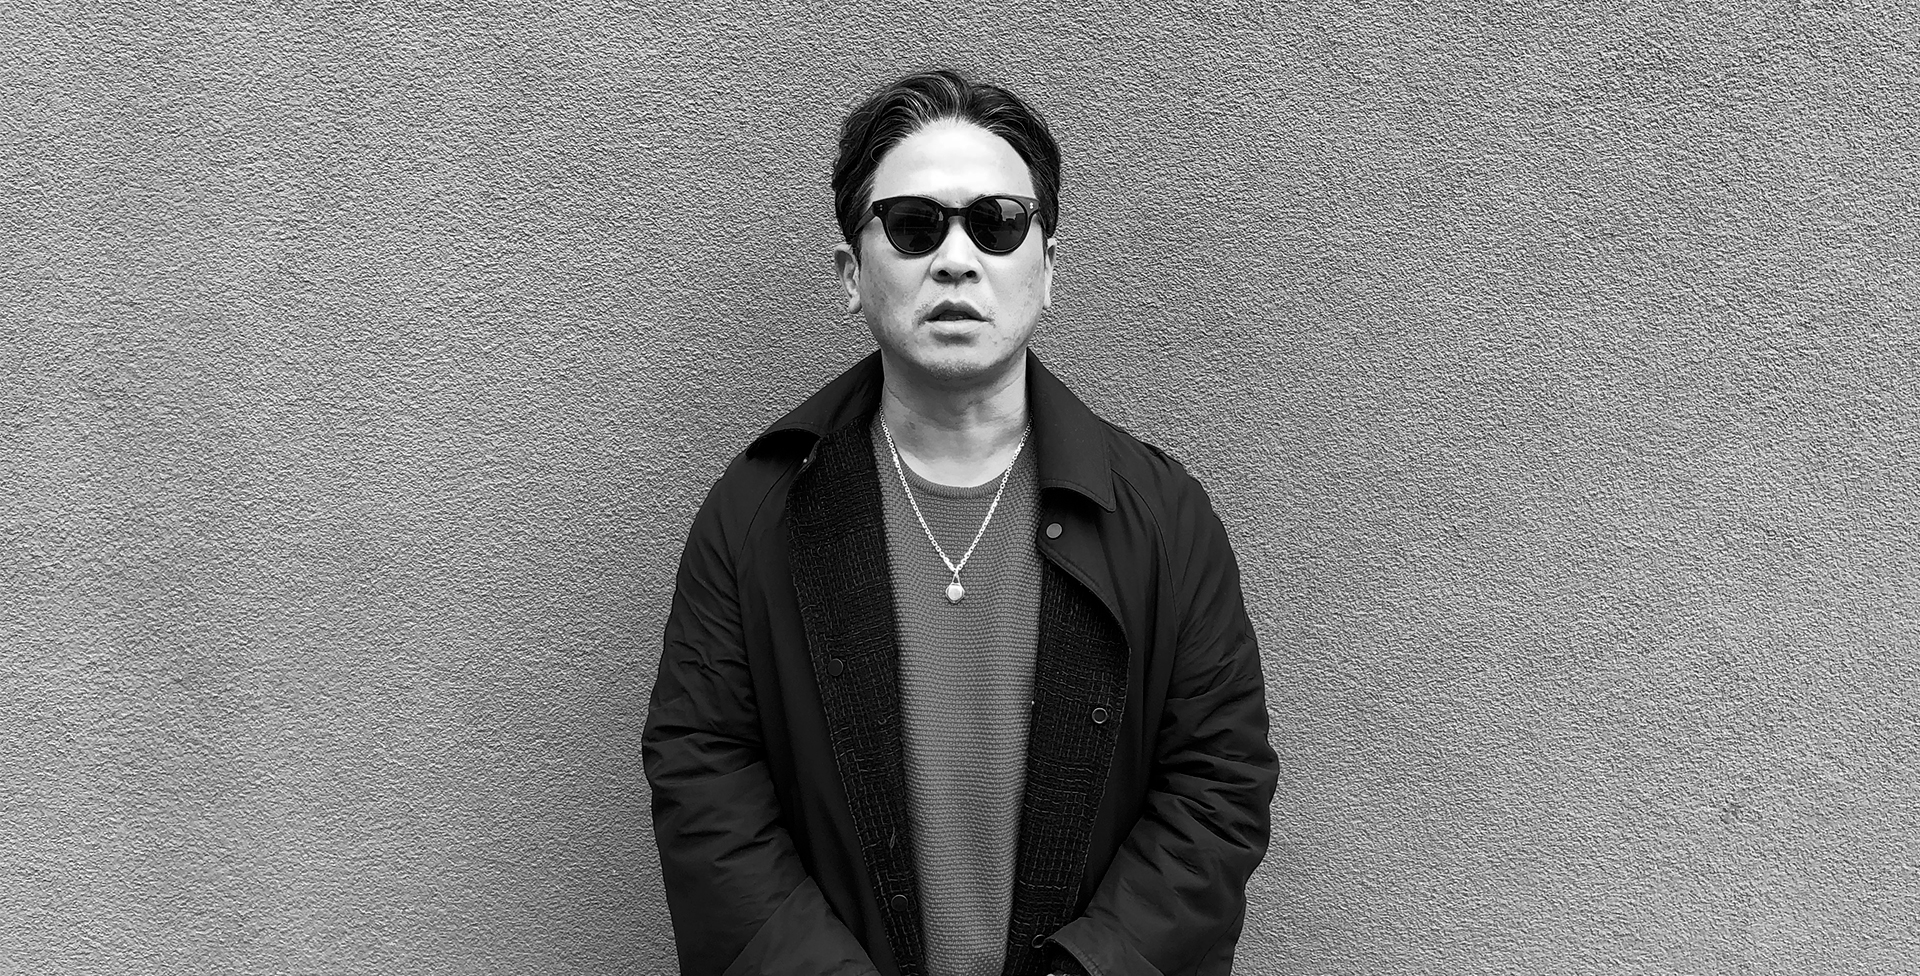 Tatsuo Hino - Men's Style Council Member